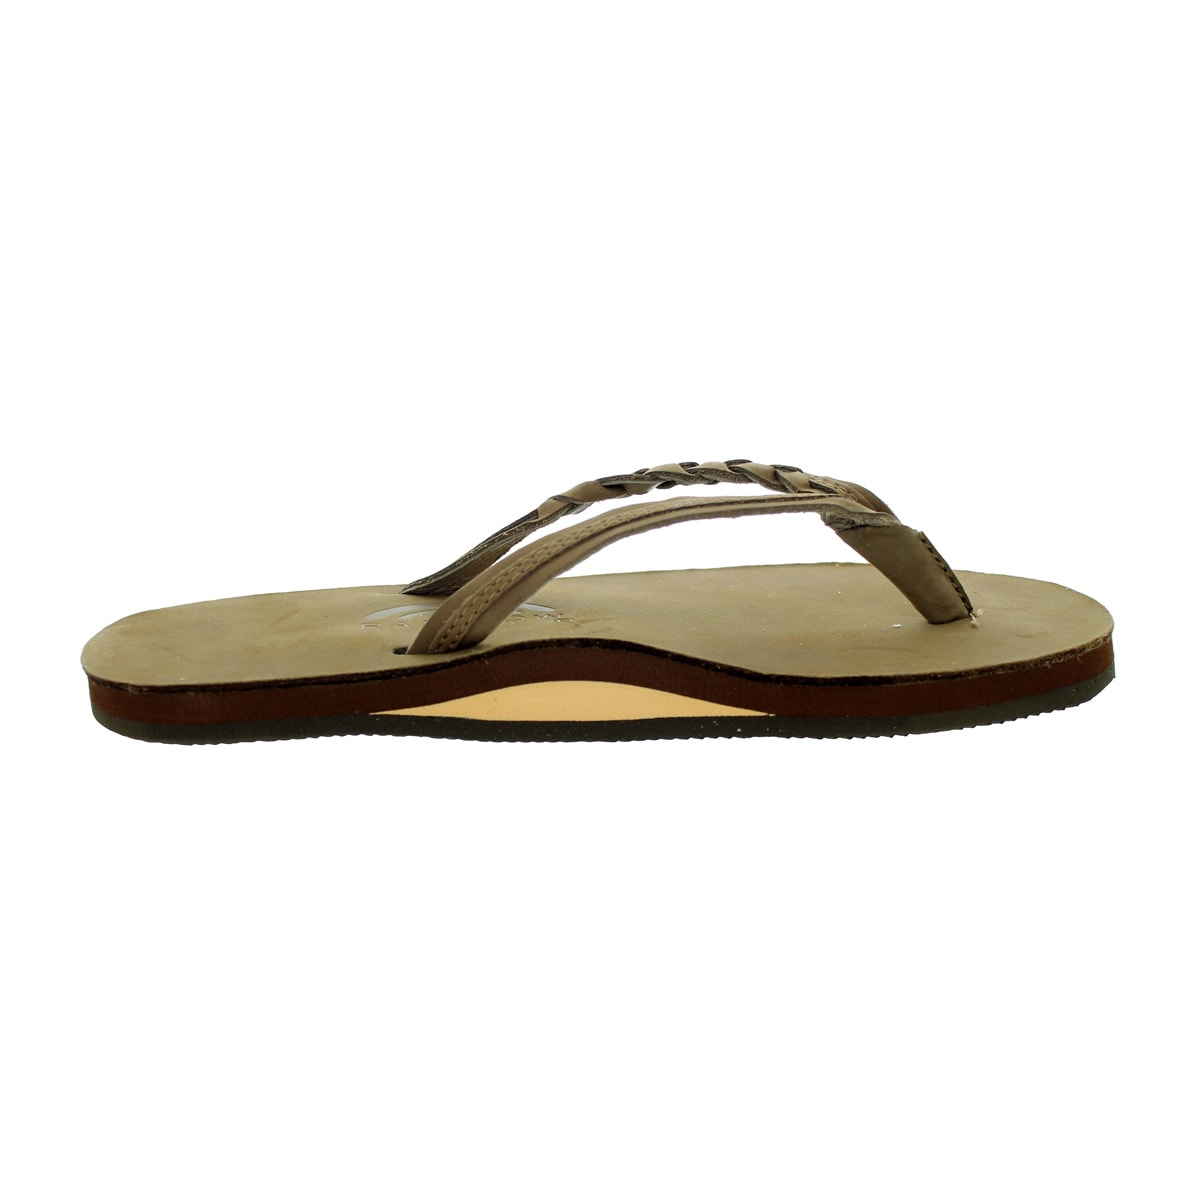 bad1421705d Shop Rainbow Sandals Women s Flirty Braidy Dark Brown Sandal Ladies 10  (9.5-10.5 Women s Us) - Free Shipping Today - Overstock - 12322167